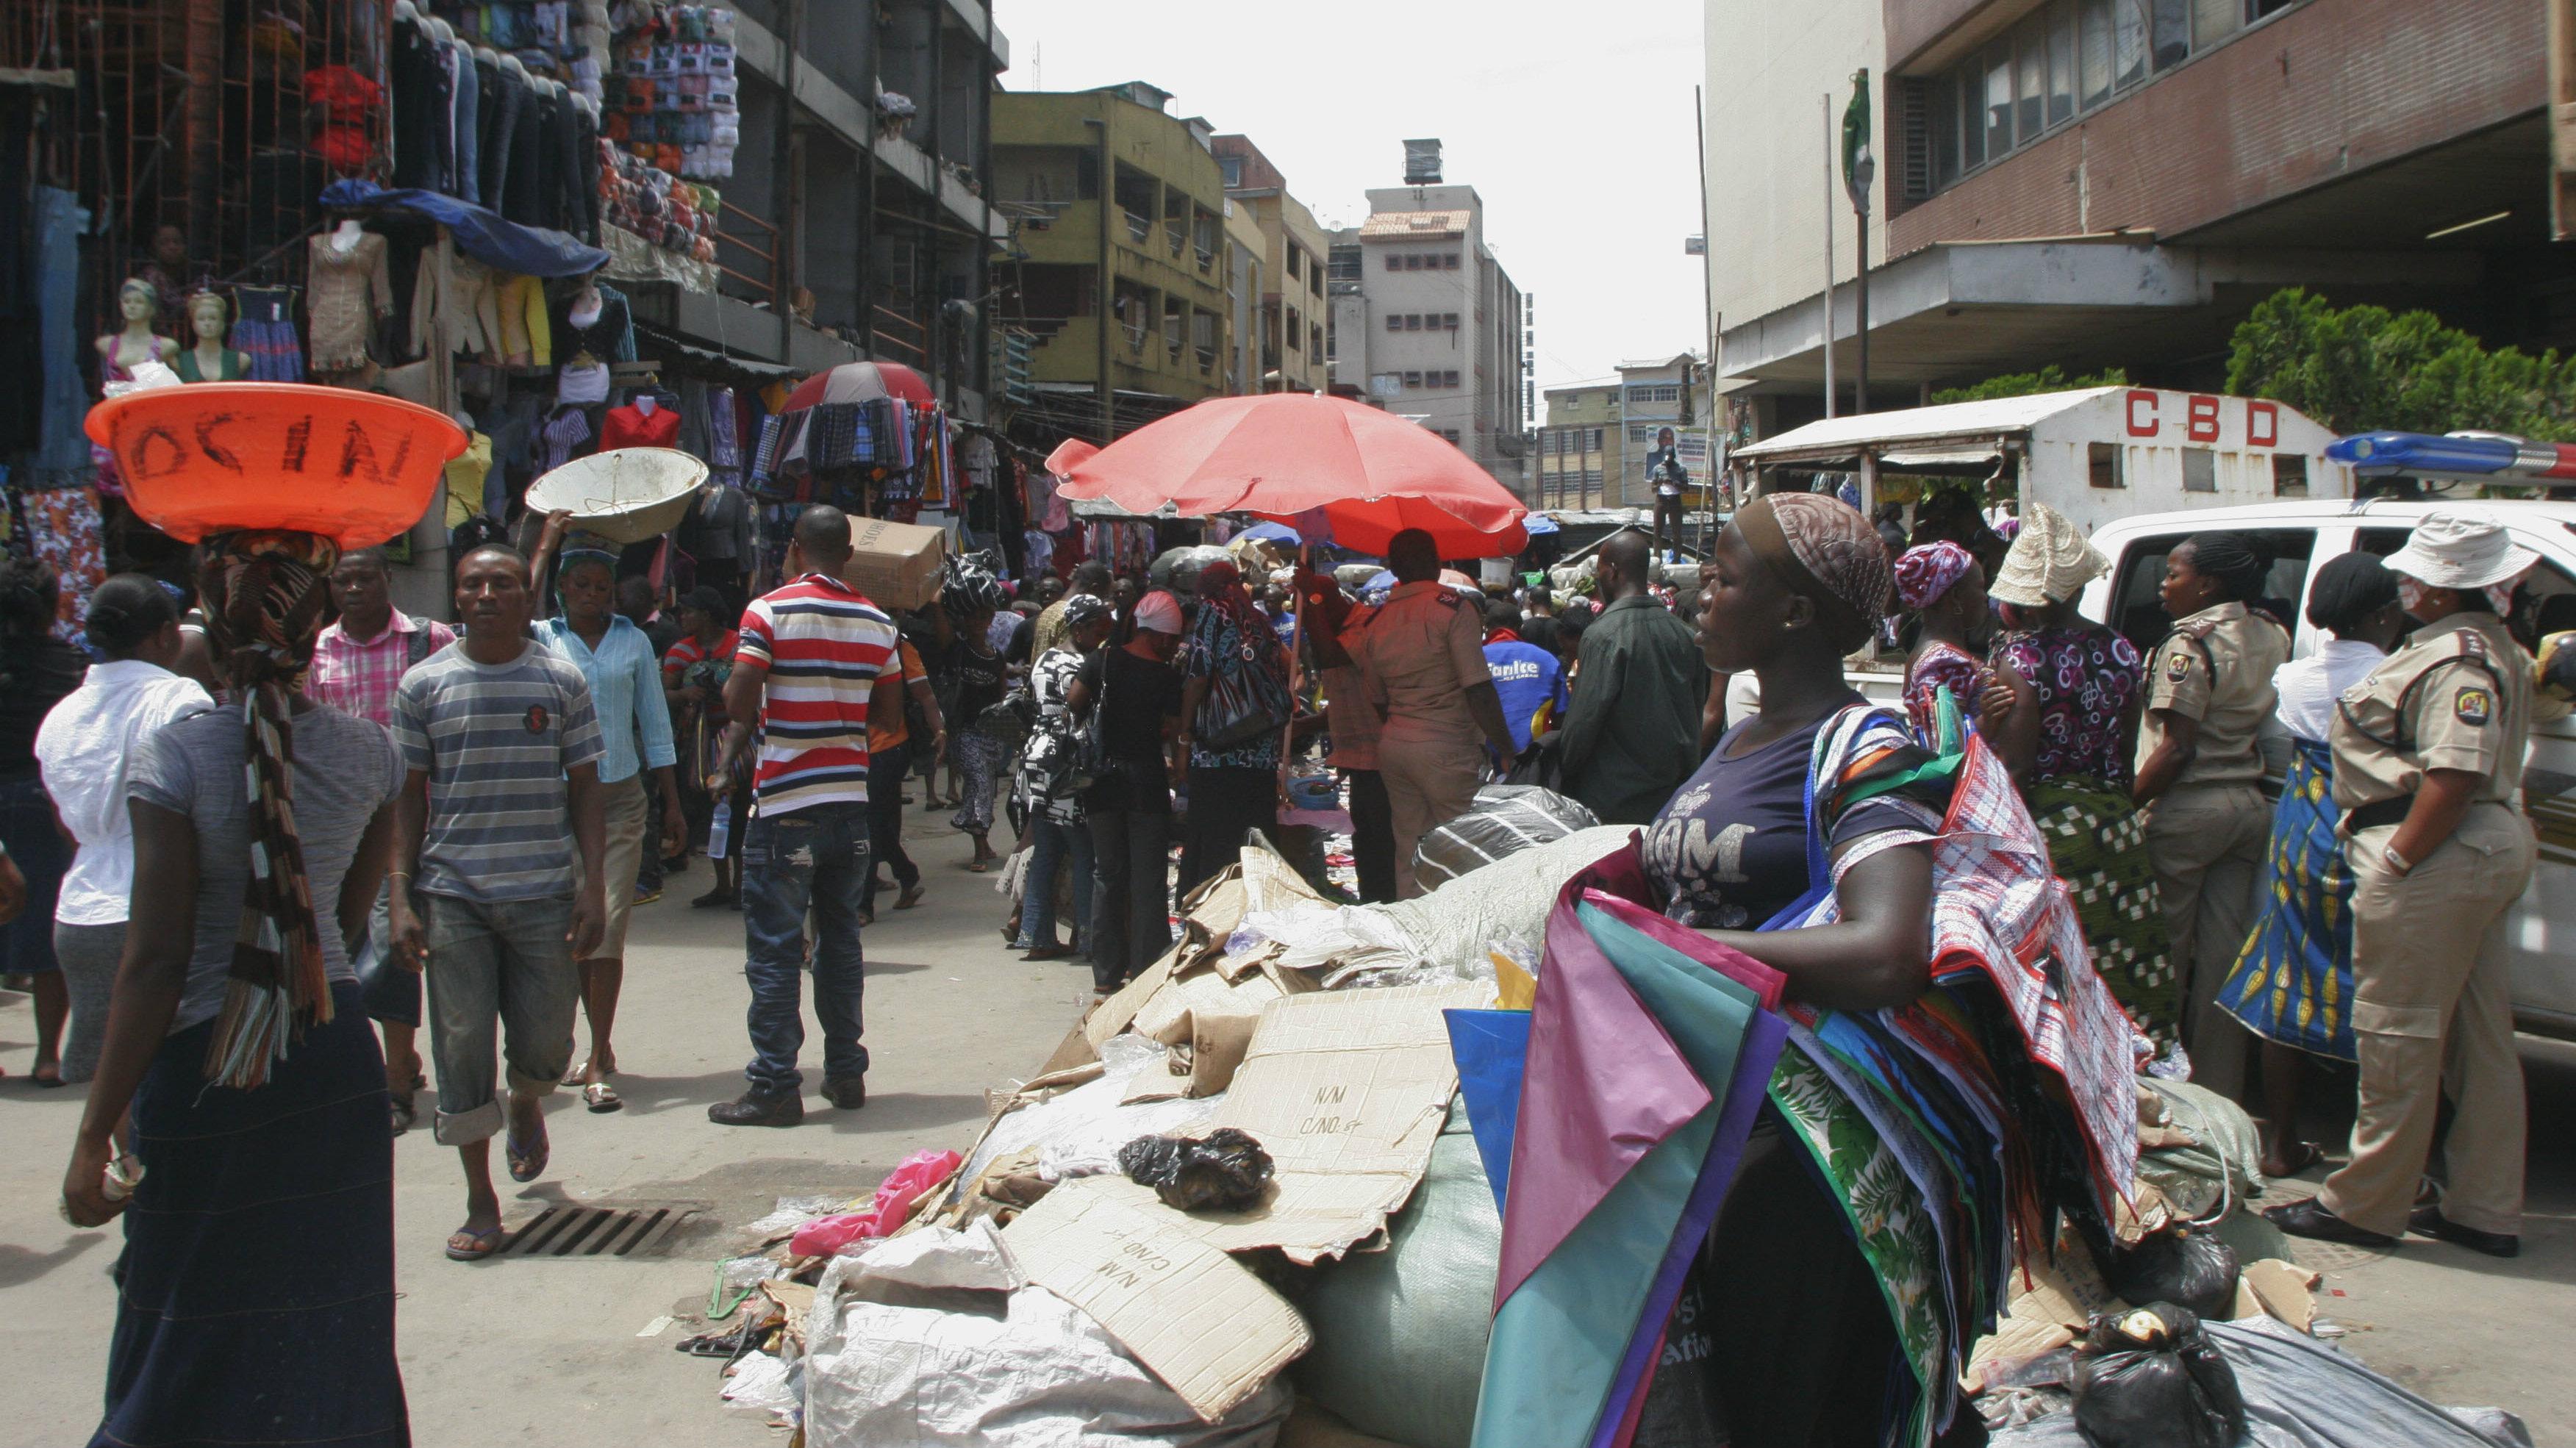 Nigeria's economy has best quarterly growth since recession - Quartz Africa